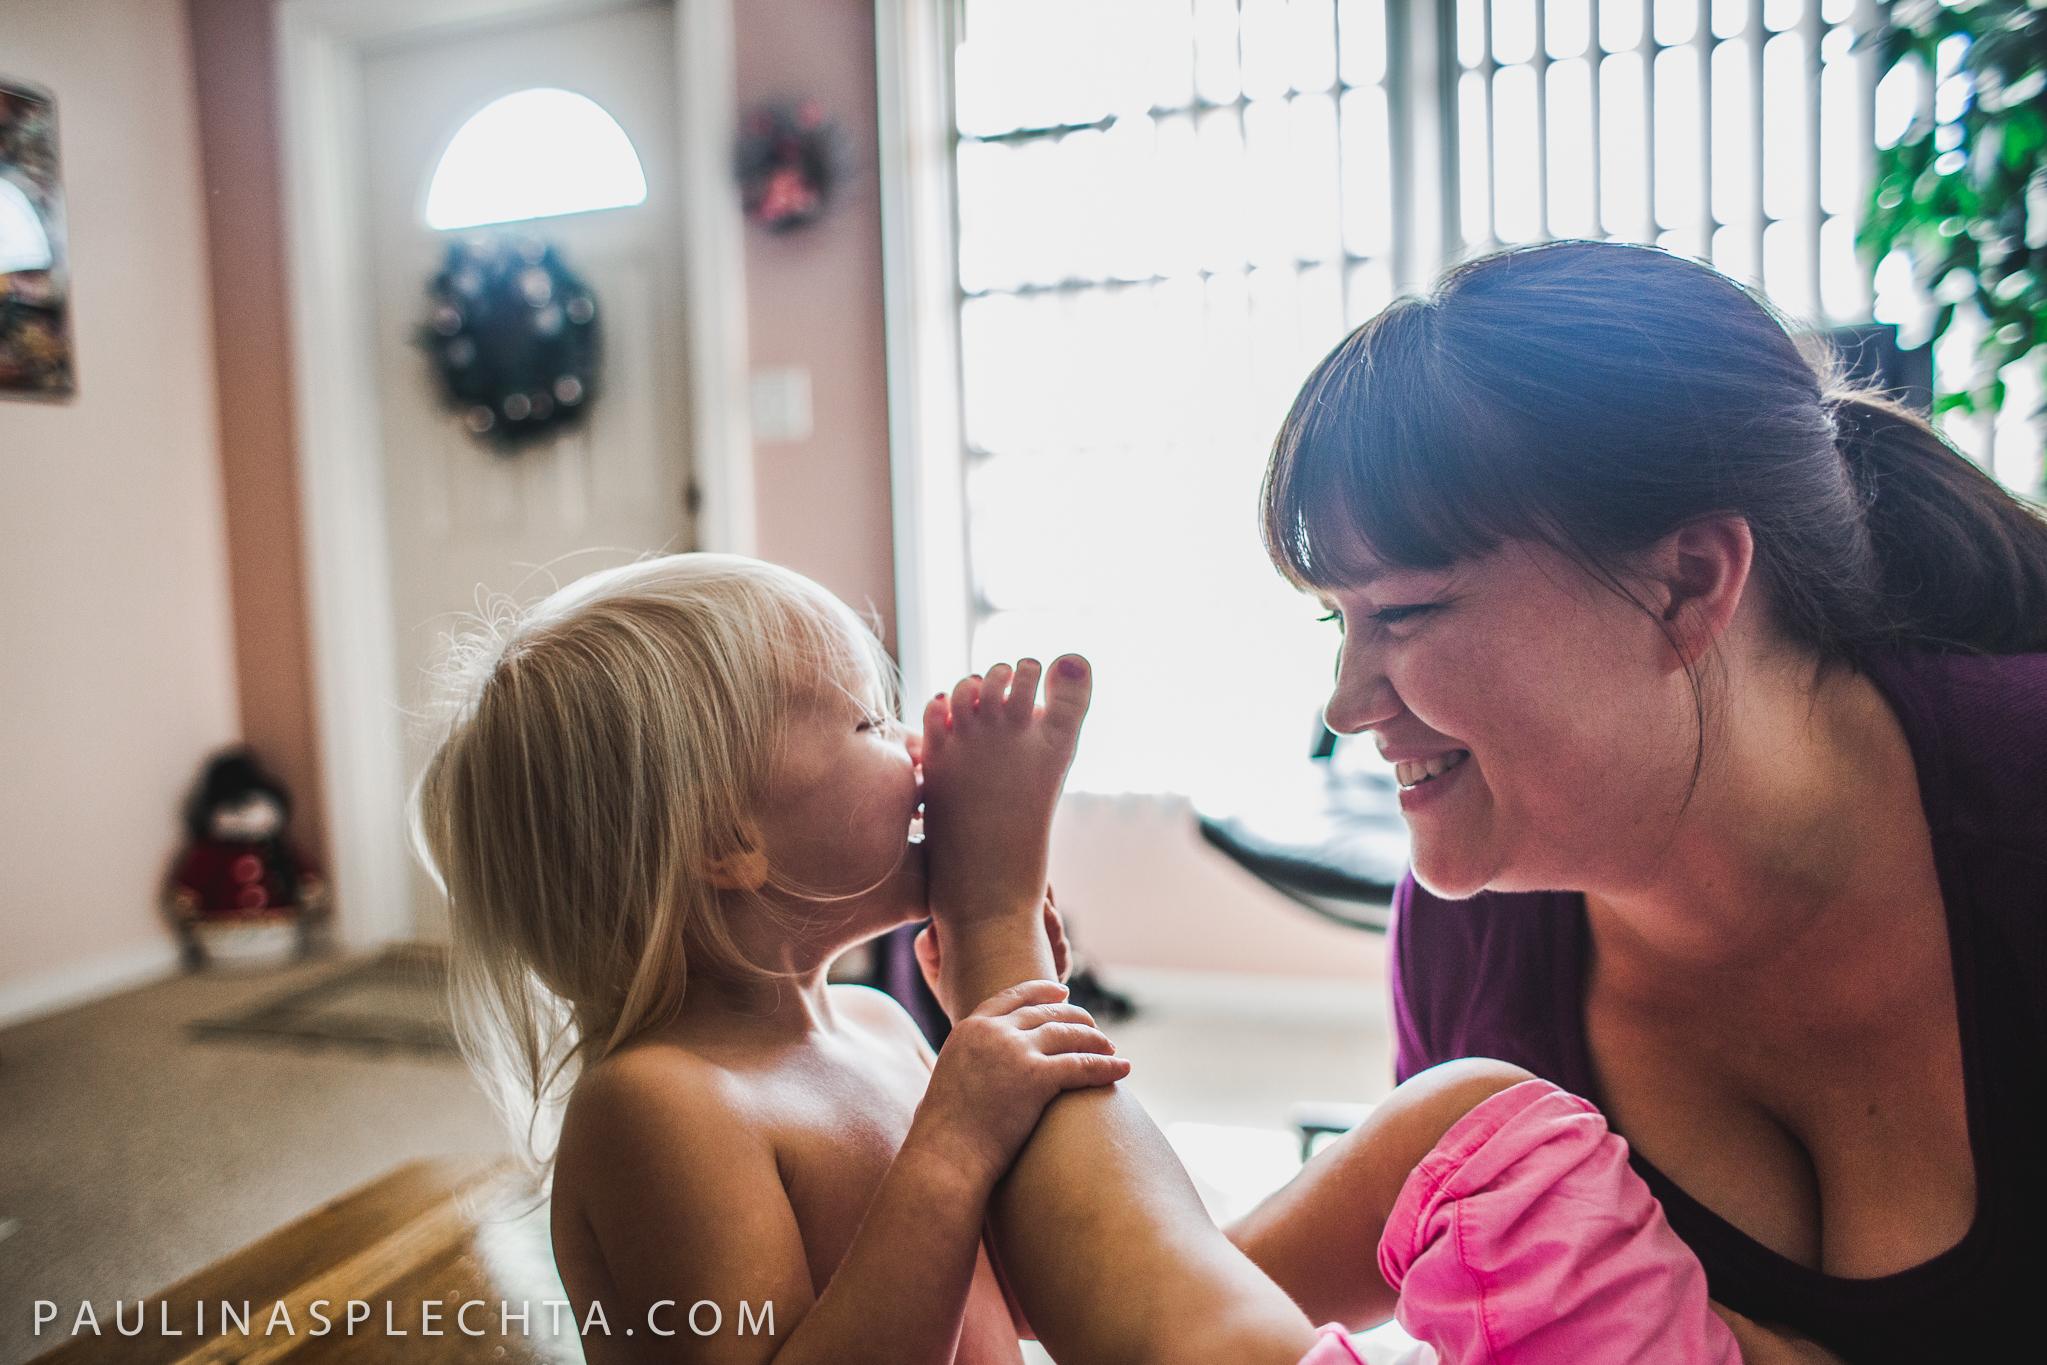 Family Photographer South Florida Pompano Broward Palm Beach Babies Baby Newborn Breastfeeding Birth Photograpy Beach Home Documentary Session-218.jpg